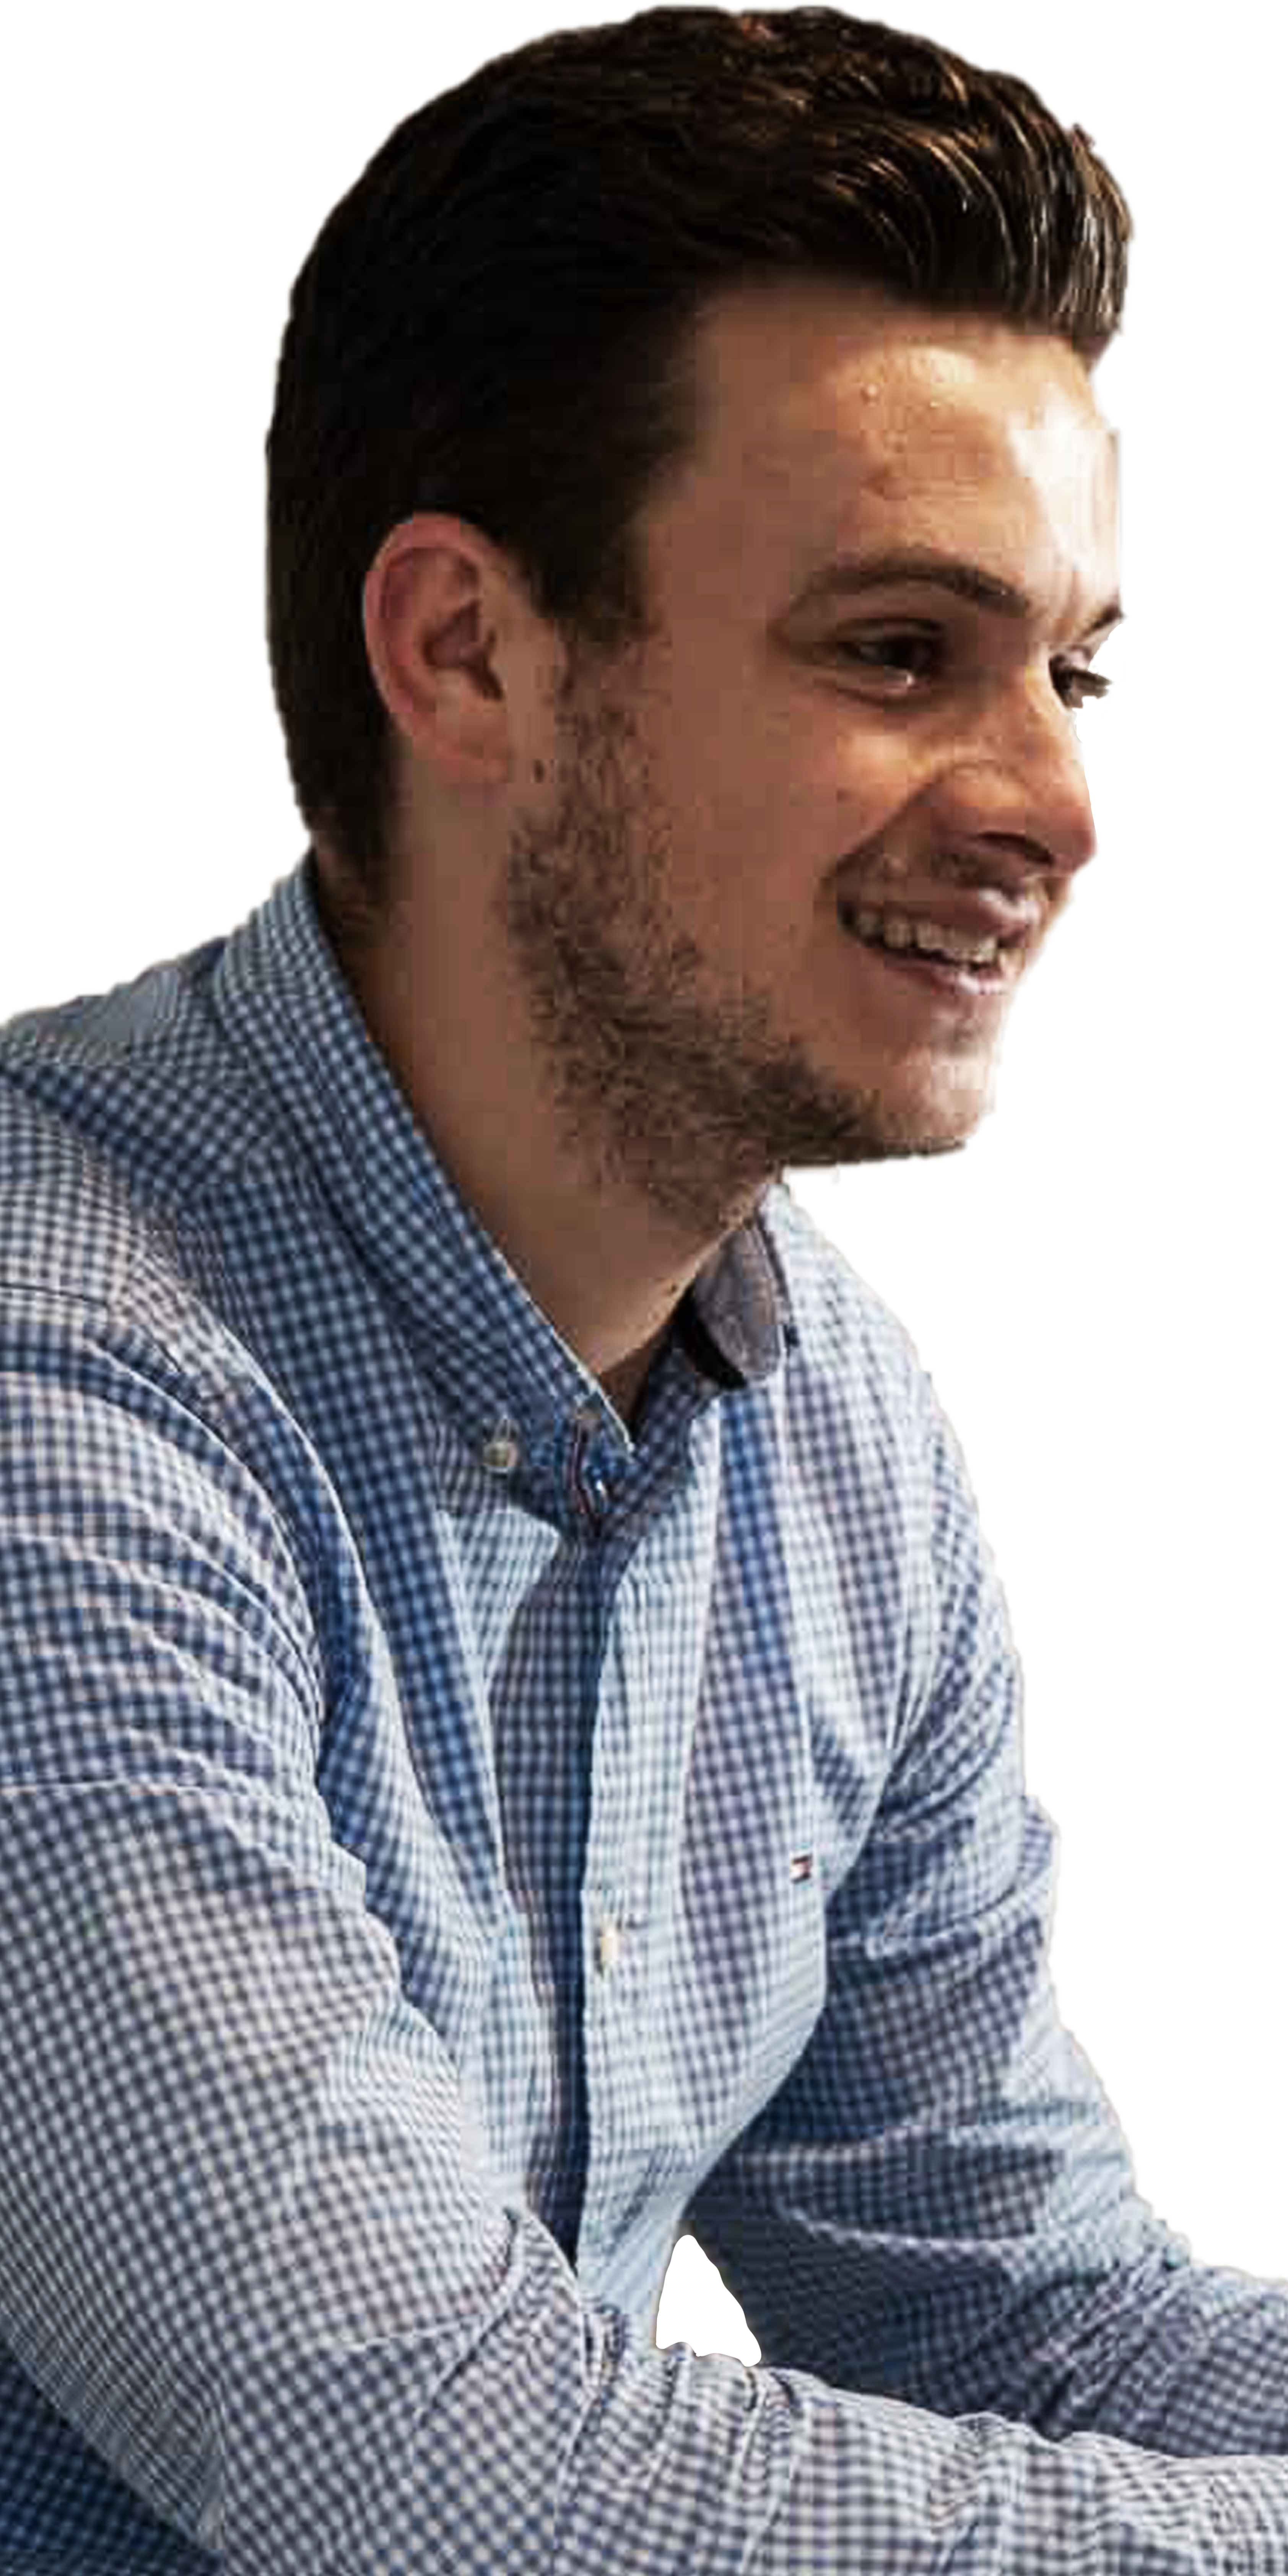 Elias Meyfroodt